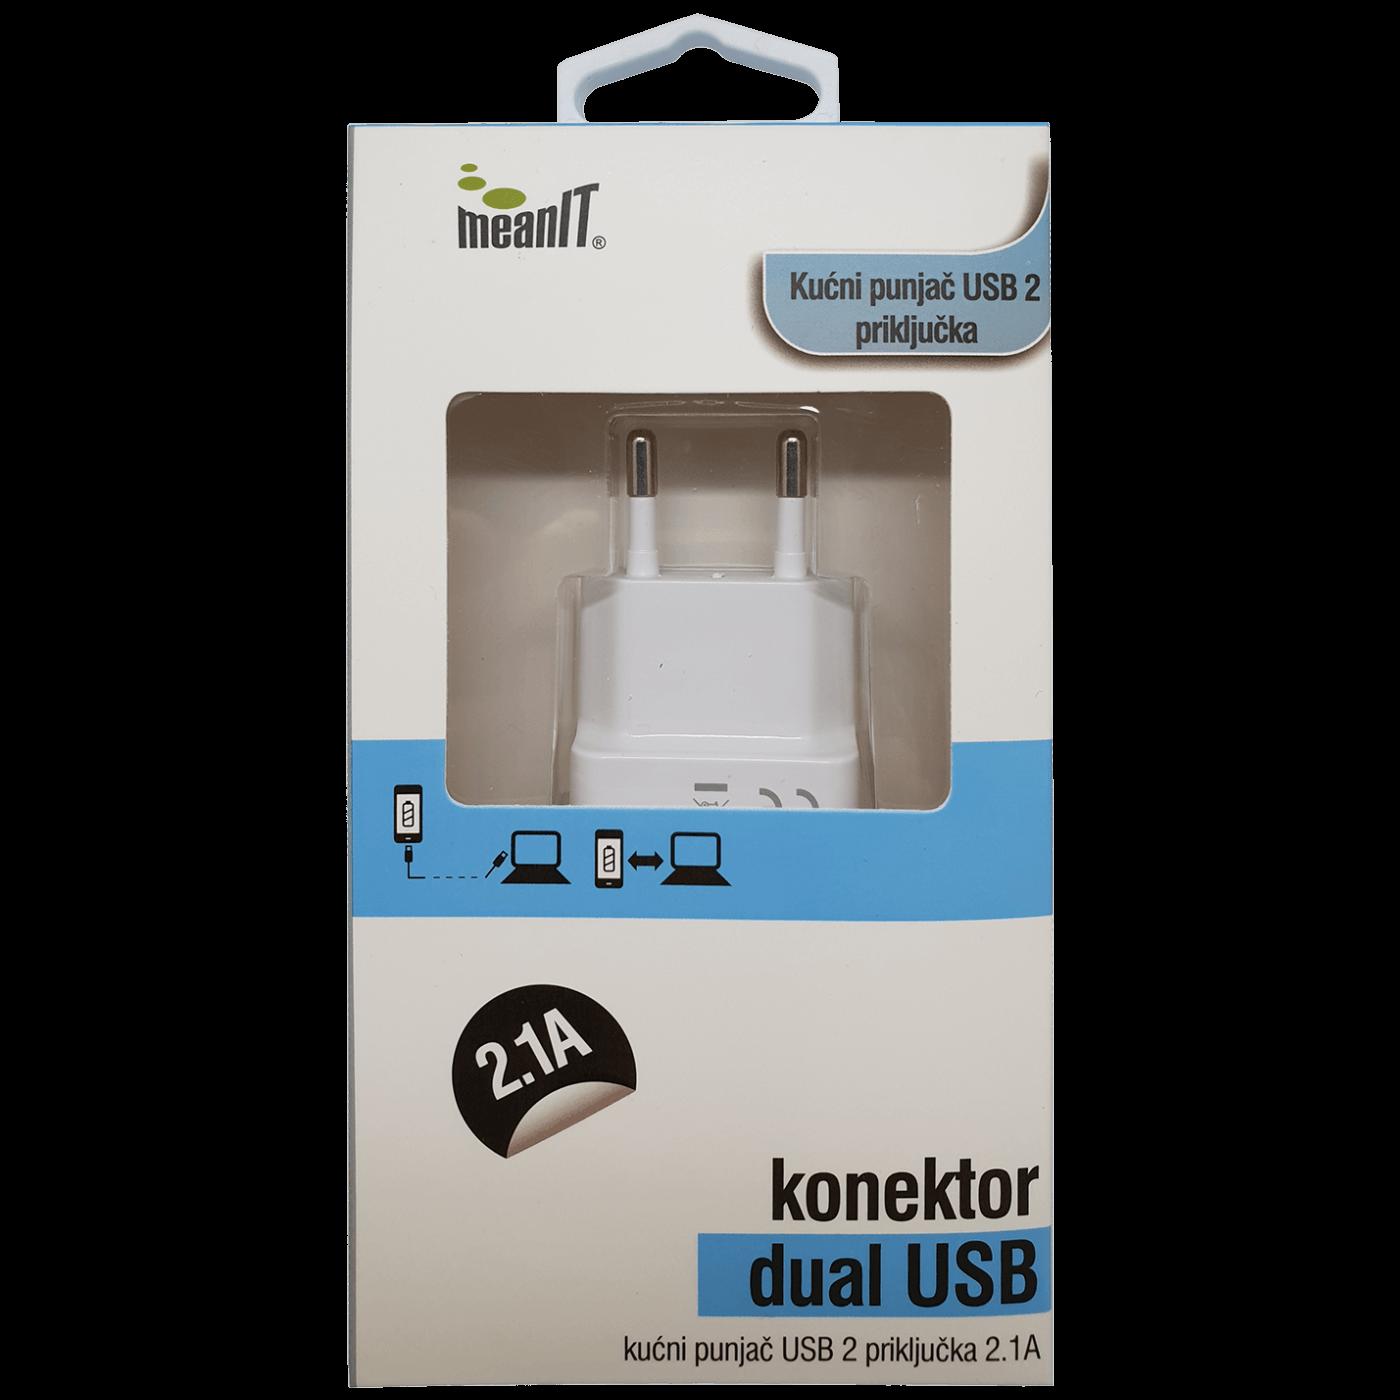 MeanIT - PUNJAČ ZA TABLET I SMARTPHONE USB 2